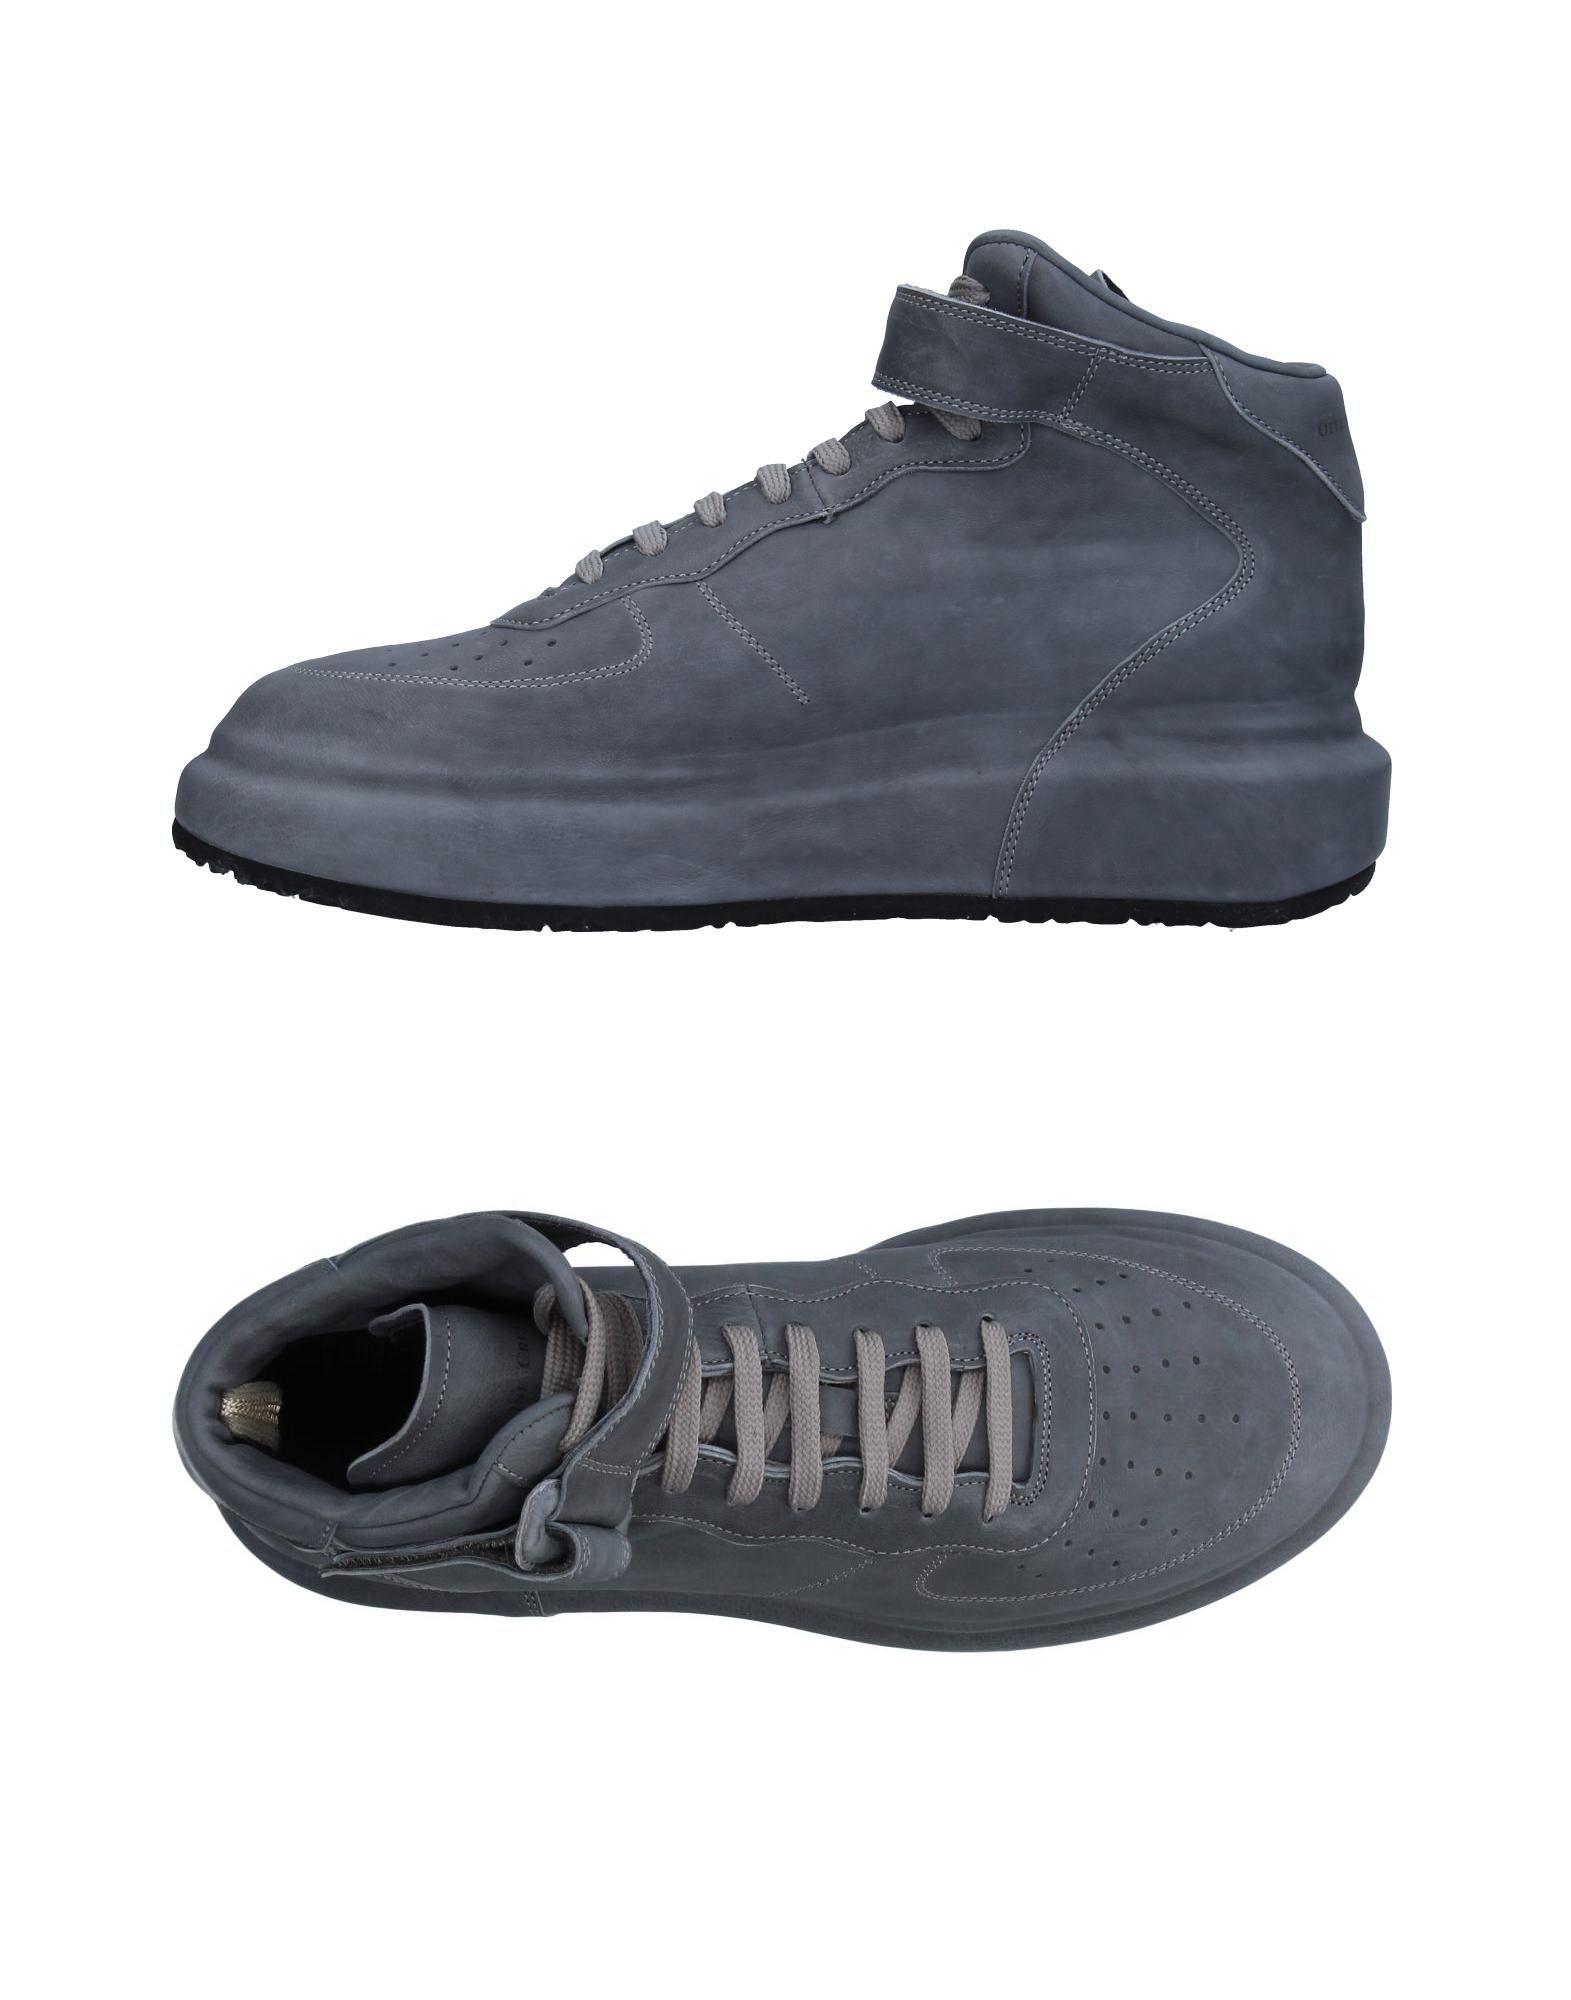 Sneakers Officine Creative Italia Homme - Sneakers Officine Creative Italia  sur